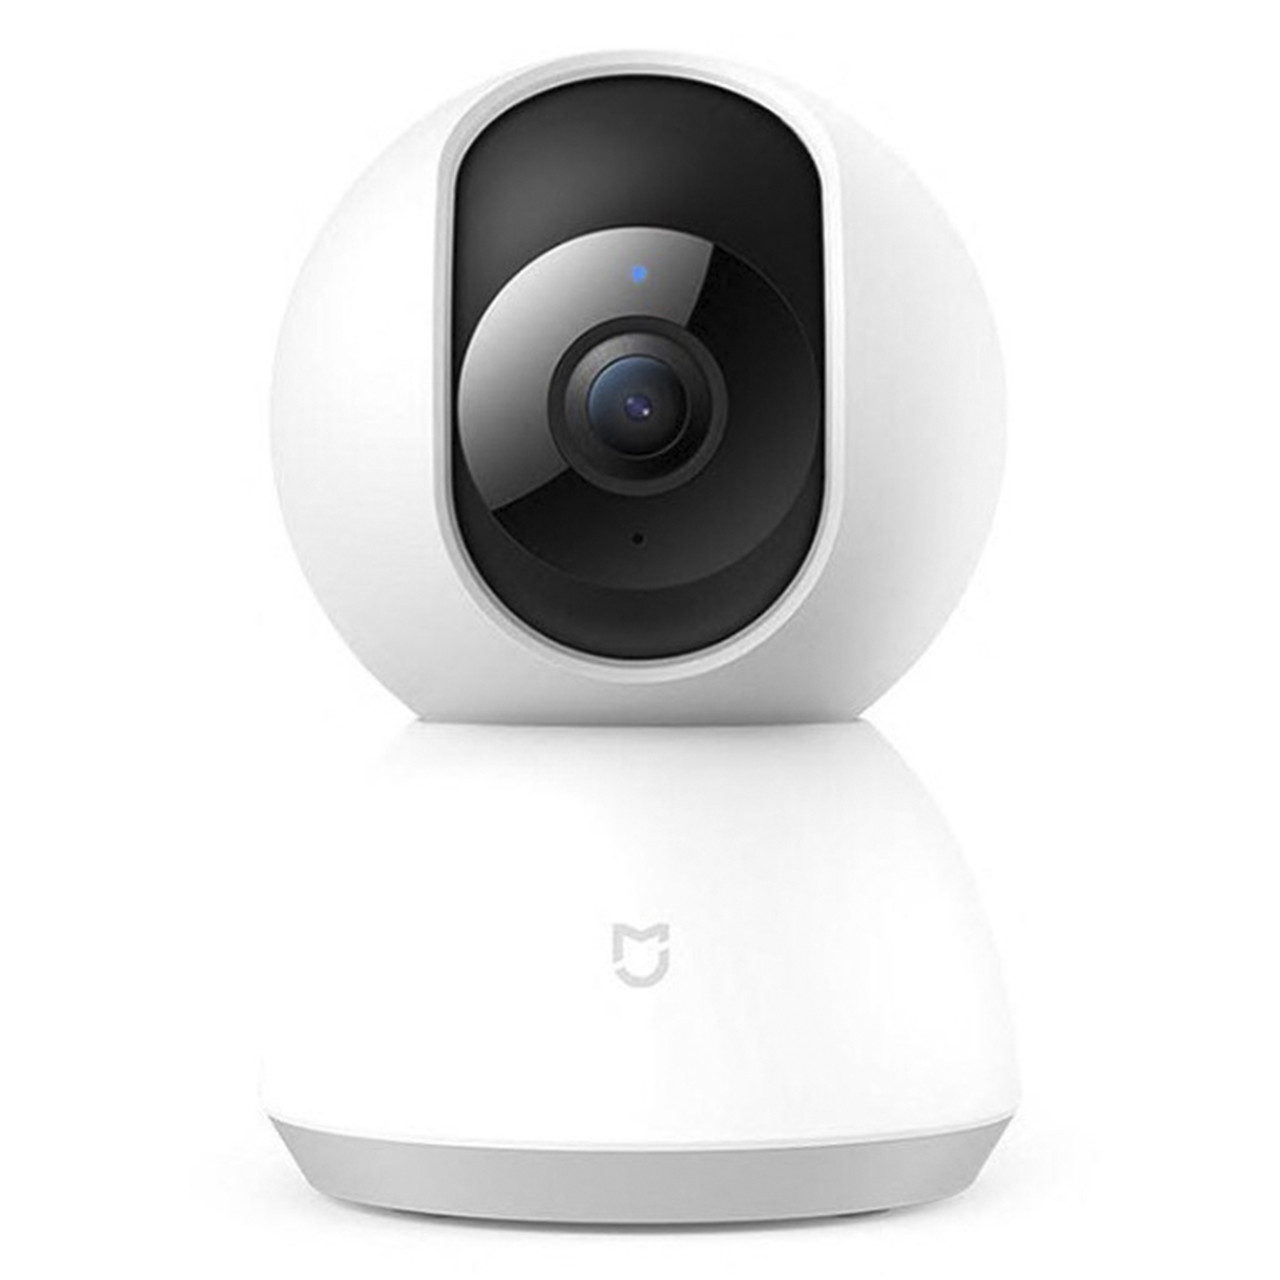 IP-камера видеонаблюдения Xiaomi MiJia 360 Home Security 1080 p (MJSXJ02CM) для умного дома smart house